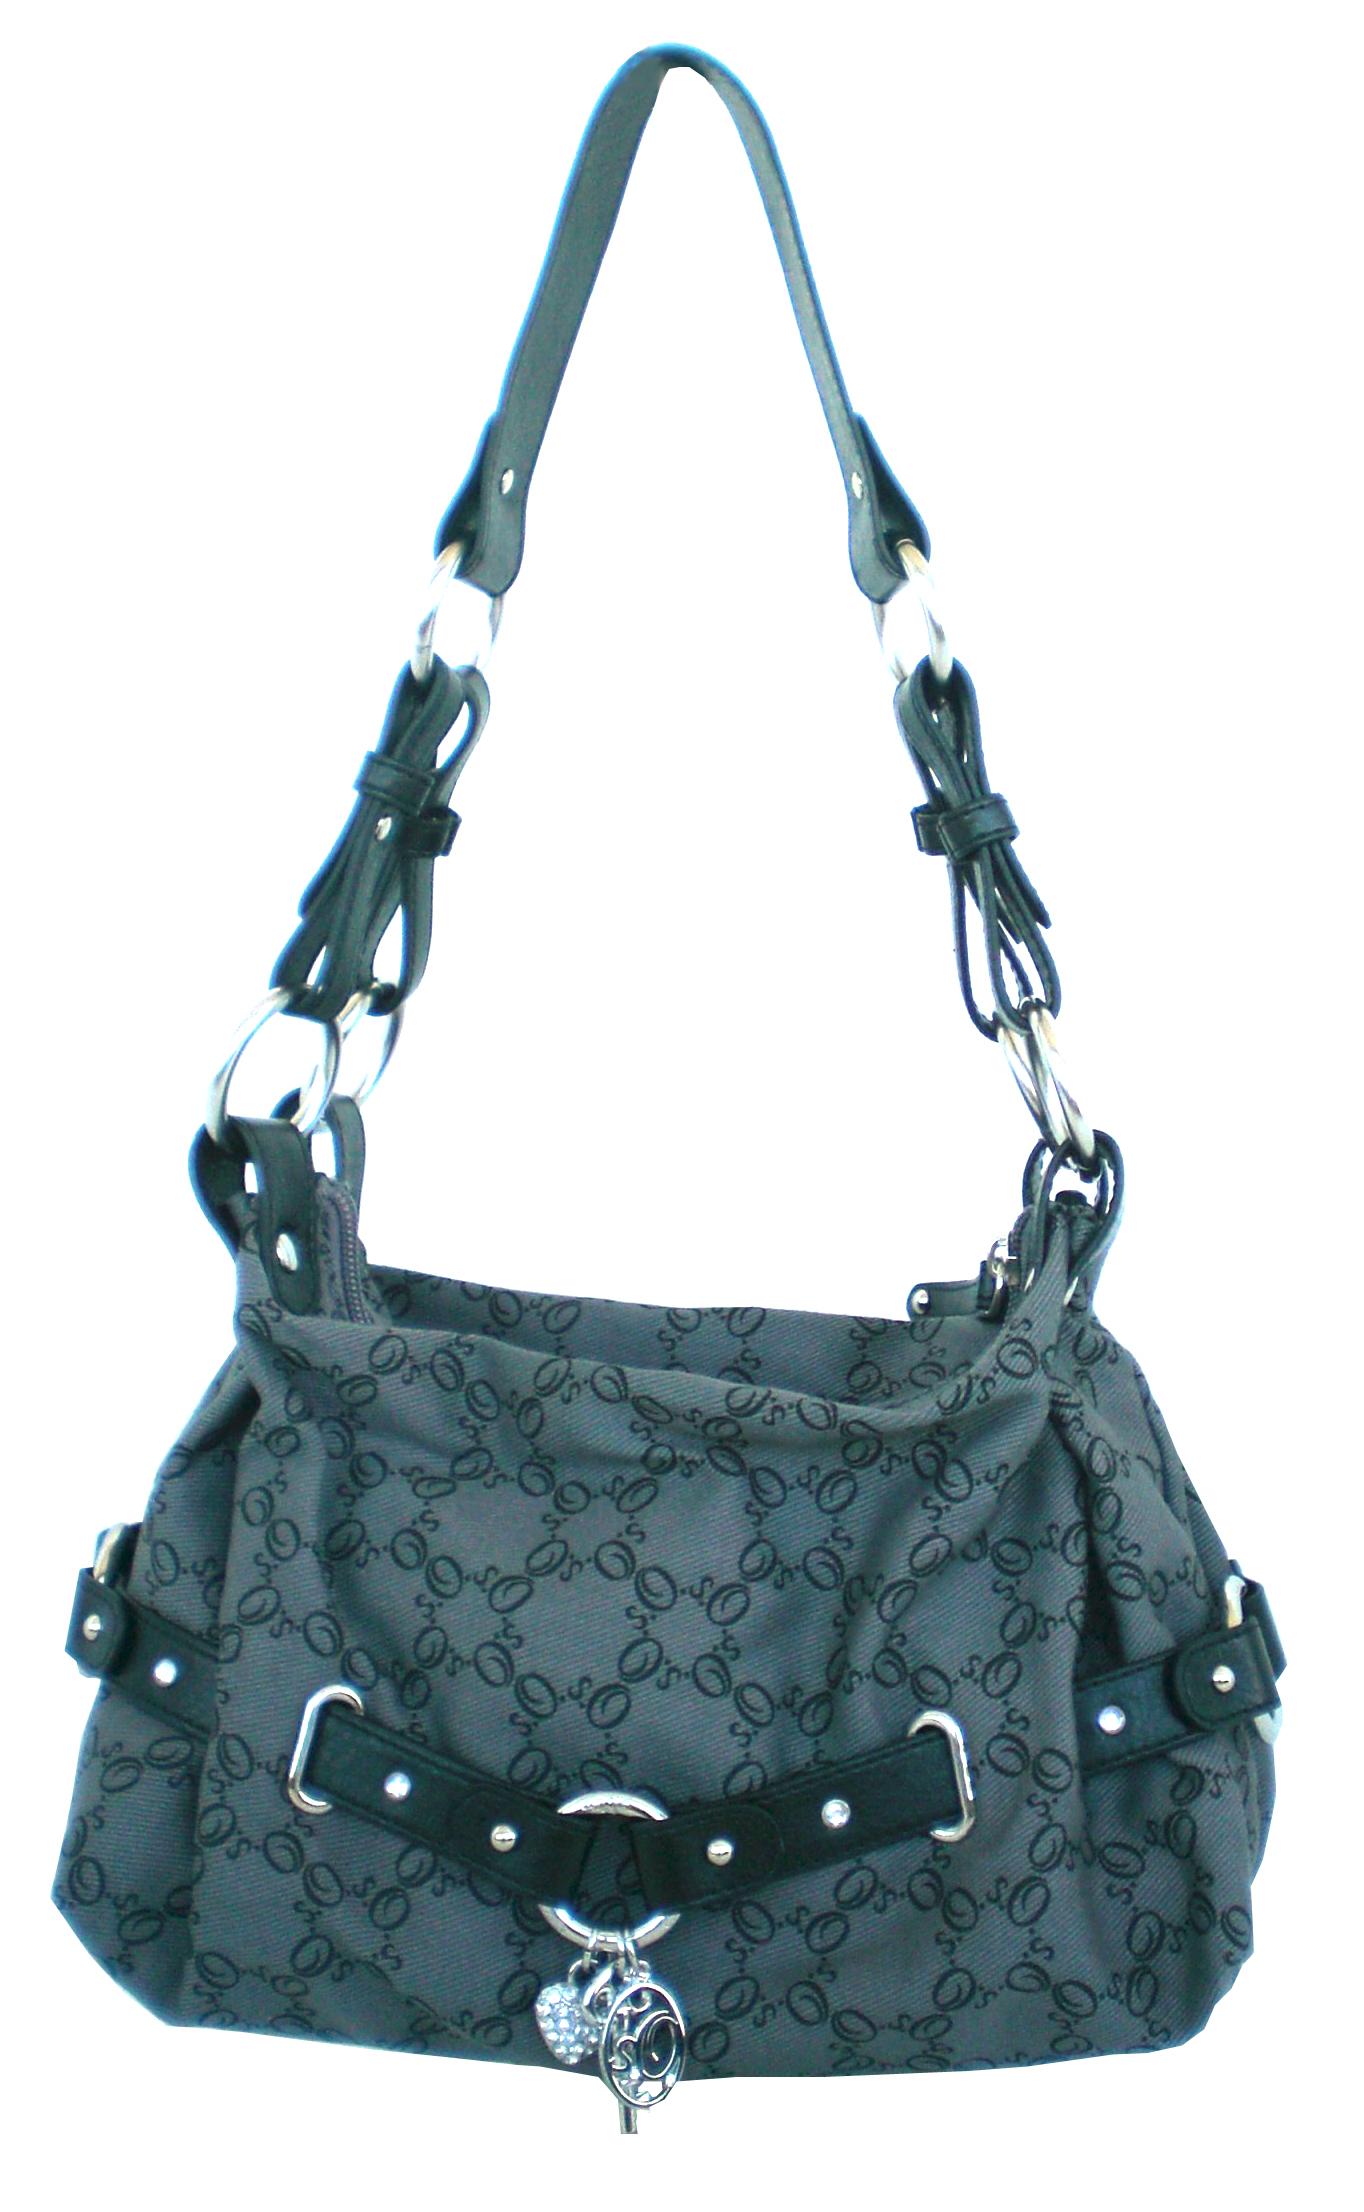 Wiki purse - FOREX Trading